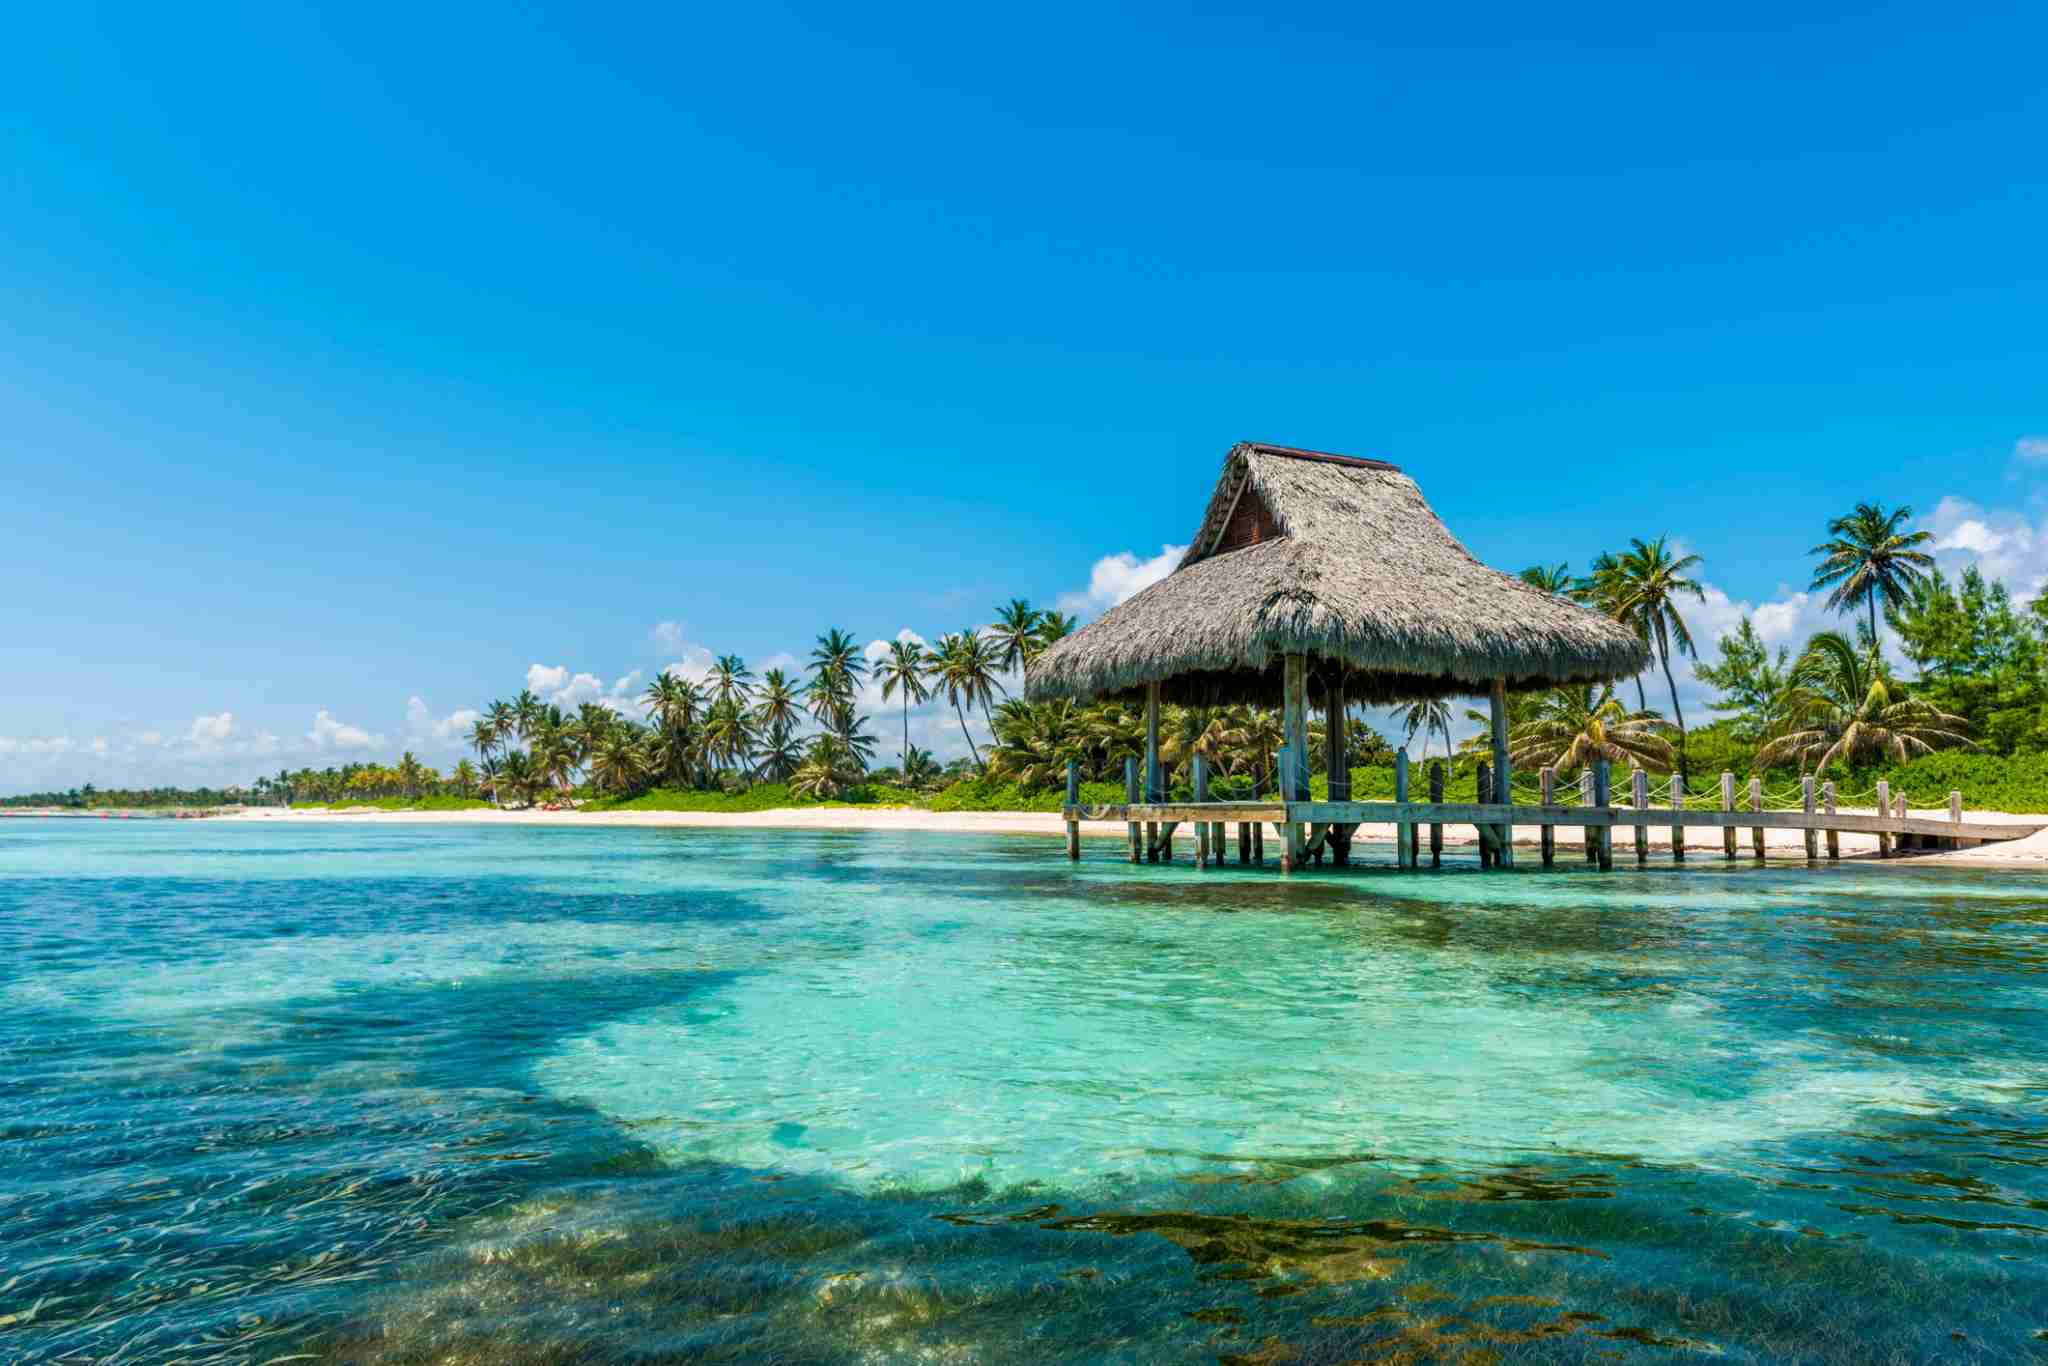 Playa Blanca, Punta Cana, Dominican Republic, Caribbean Sea. (Photo by © Marco Bottigelli / Getty Images)